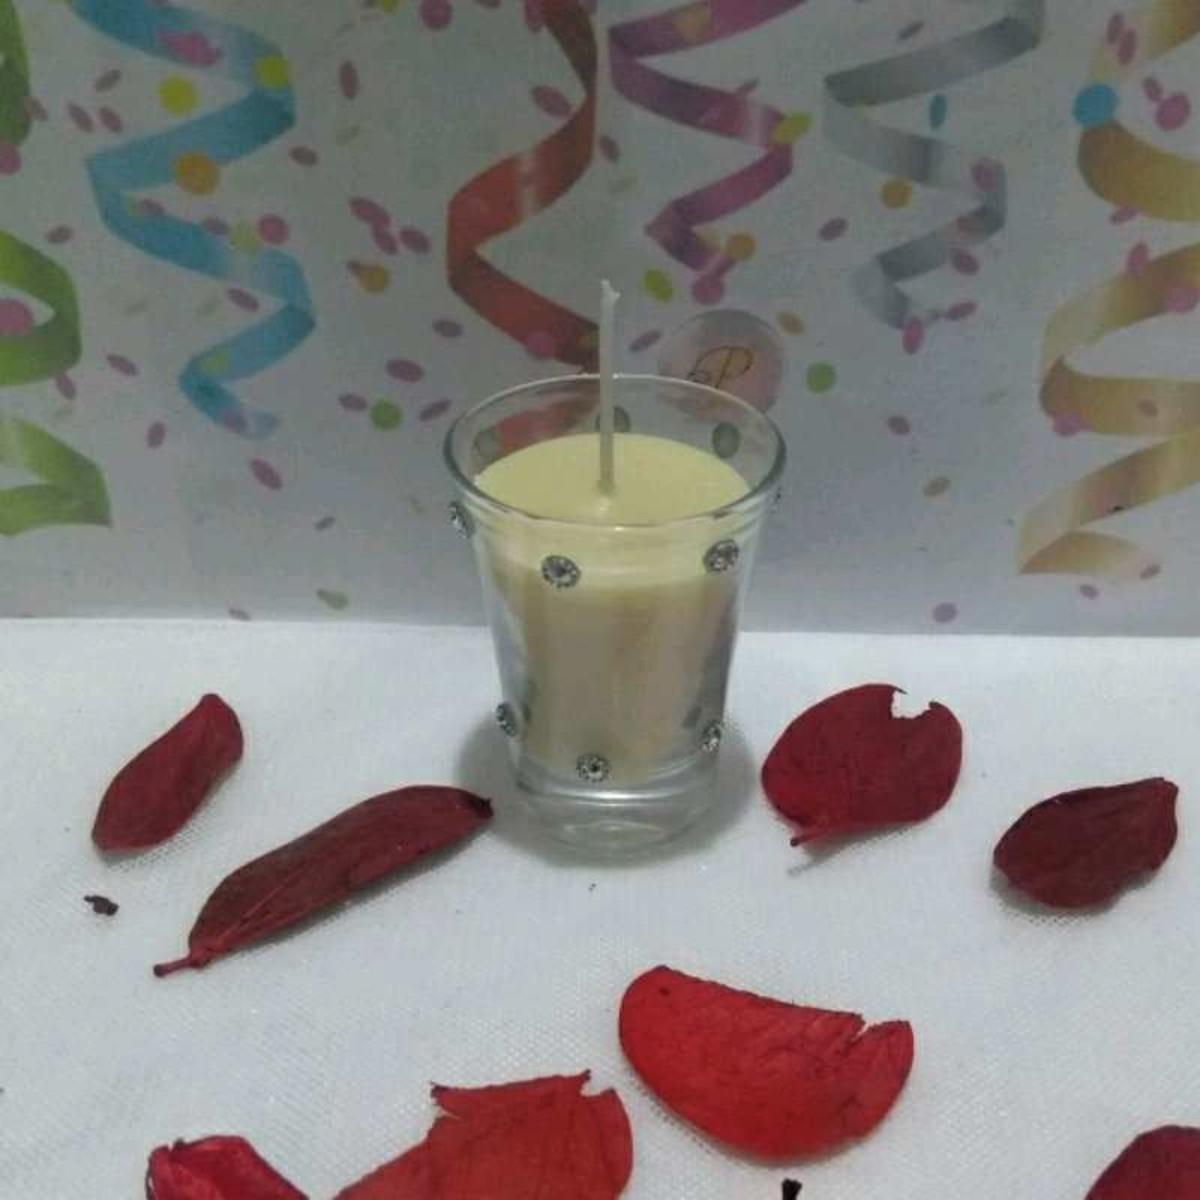 Vela de Massagem Copo Dose 60ml Brinde Candle Massage